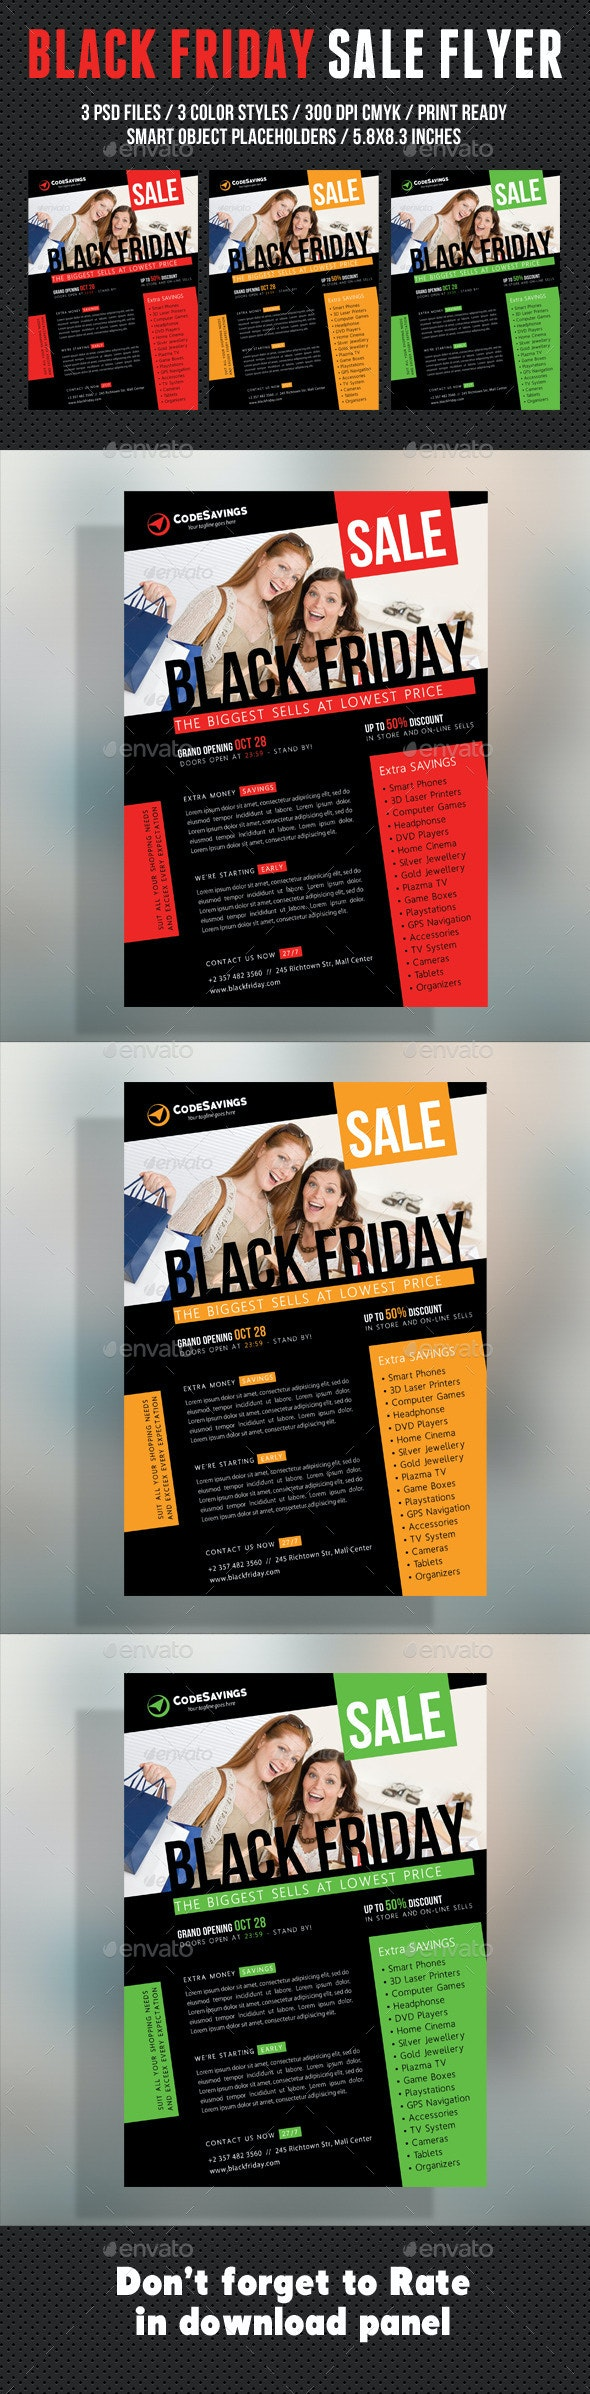 Black Friday Flyer V03 - Commerce Flyers